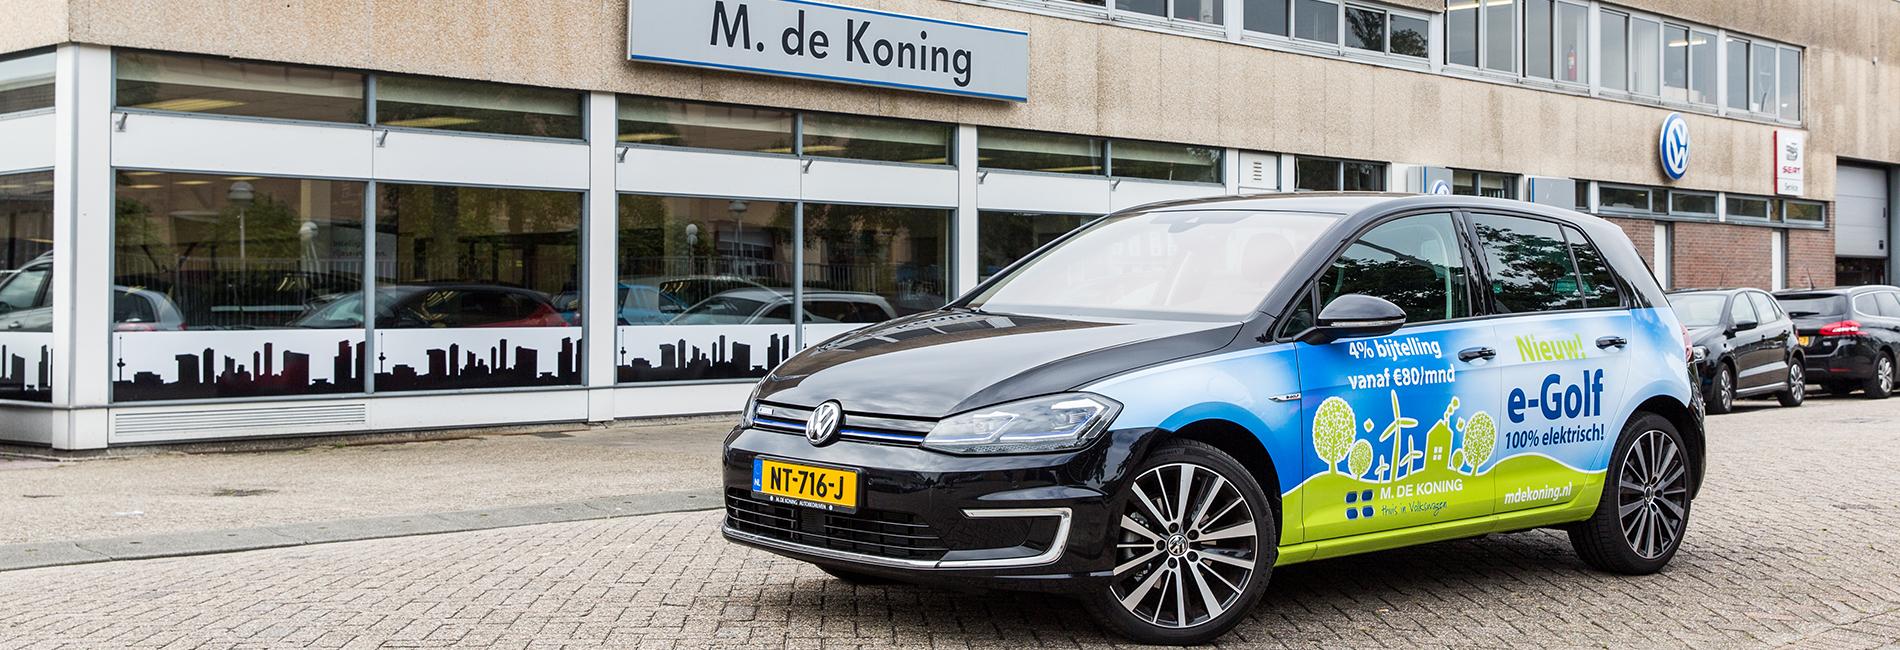 Dealer M De Koning Rotterdam Volkswagen Nl